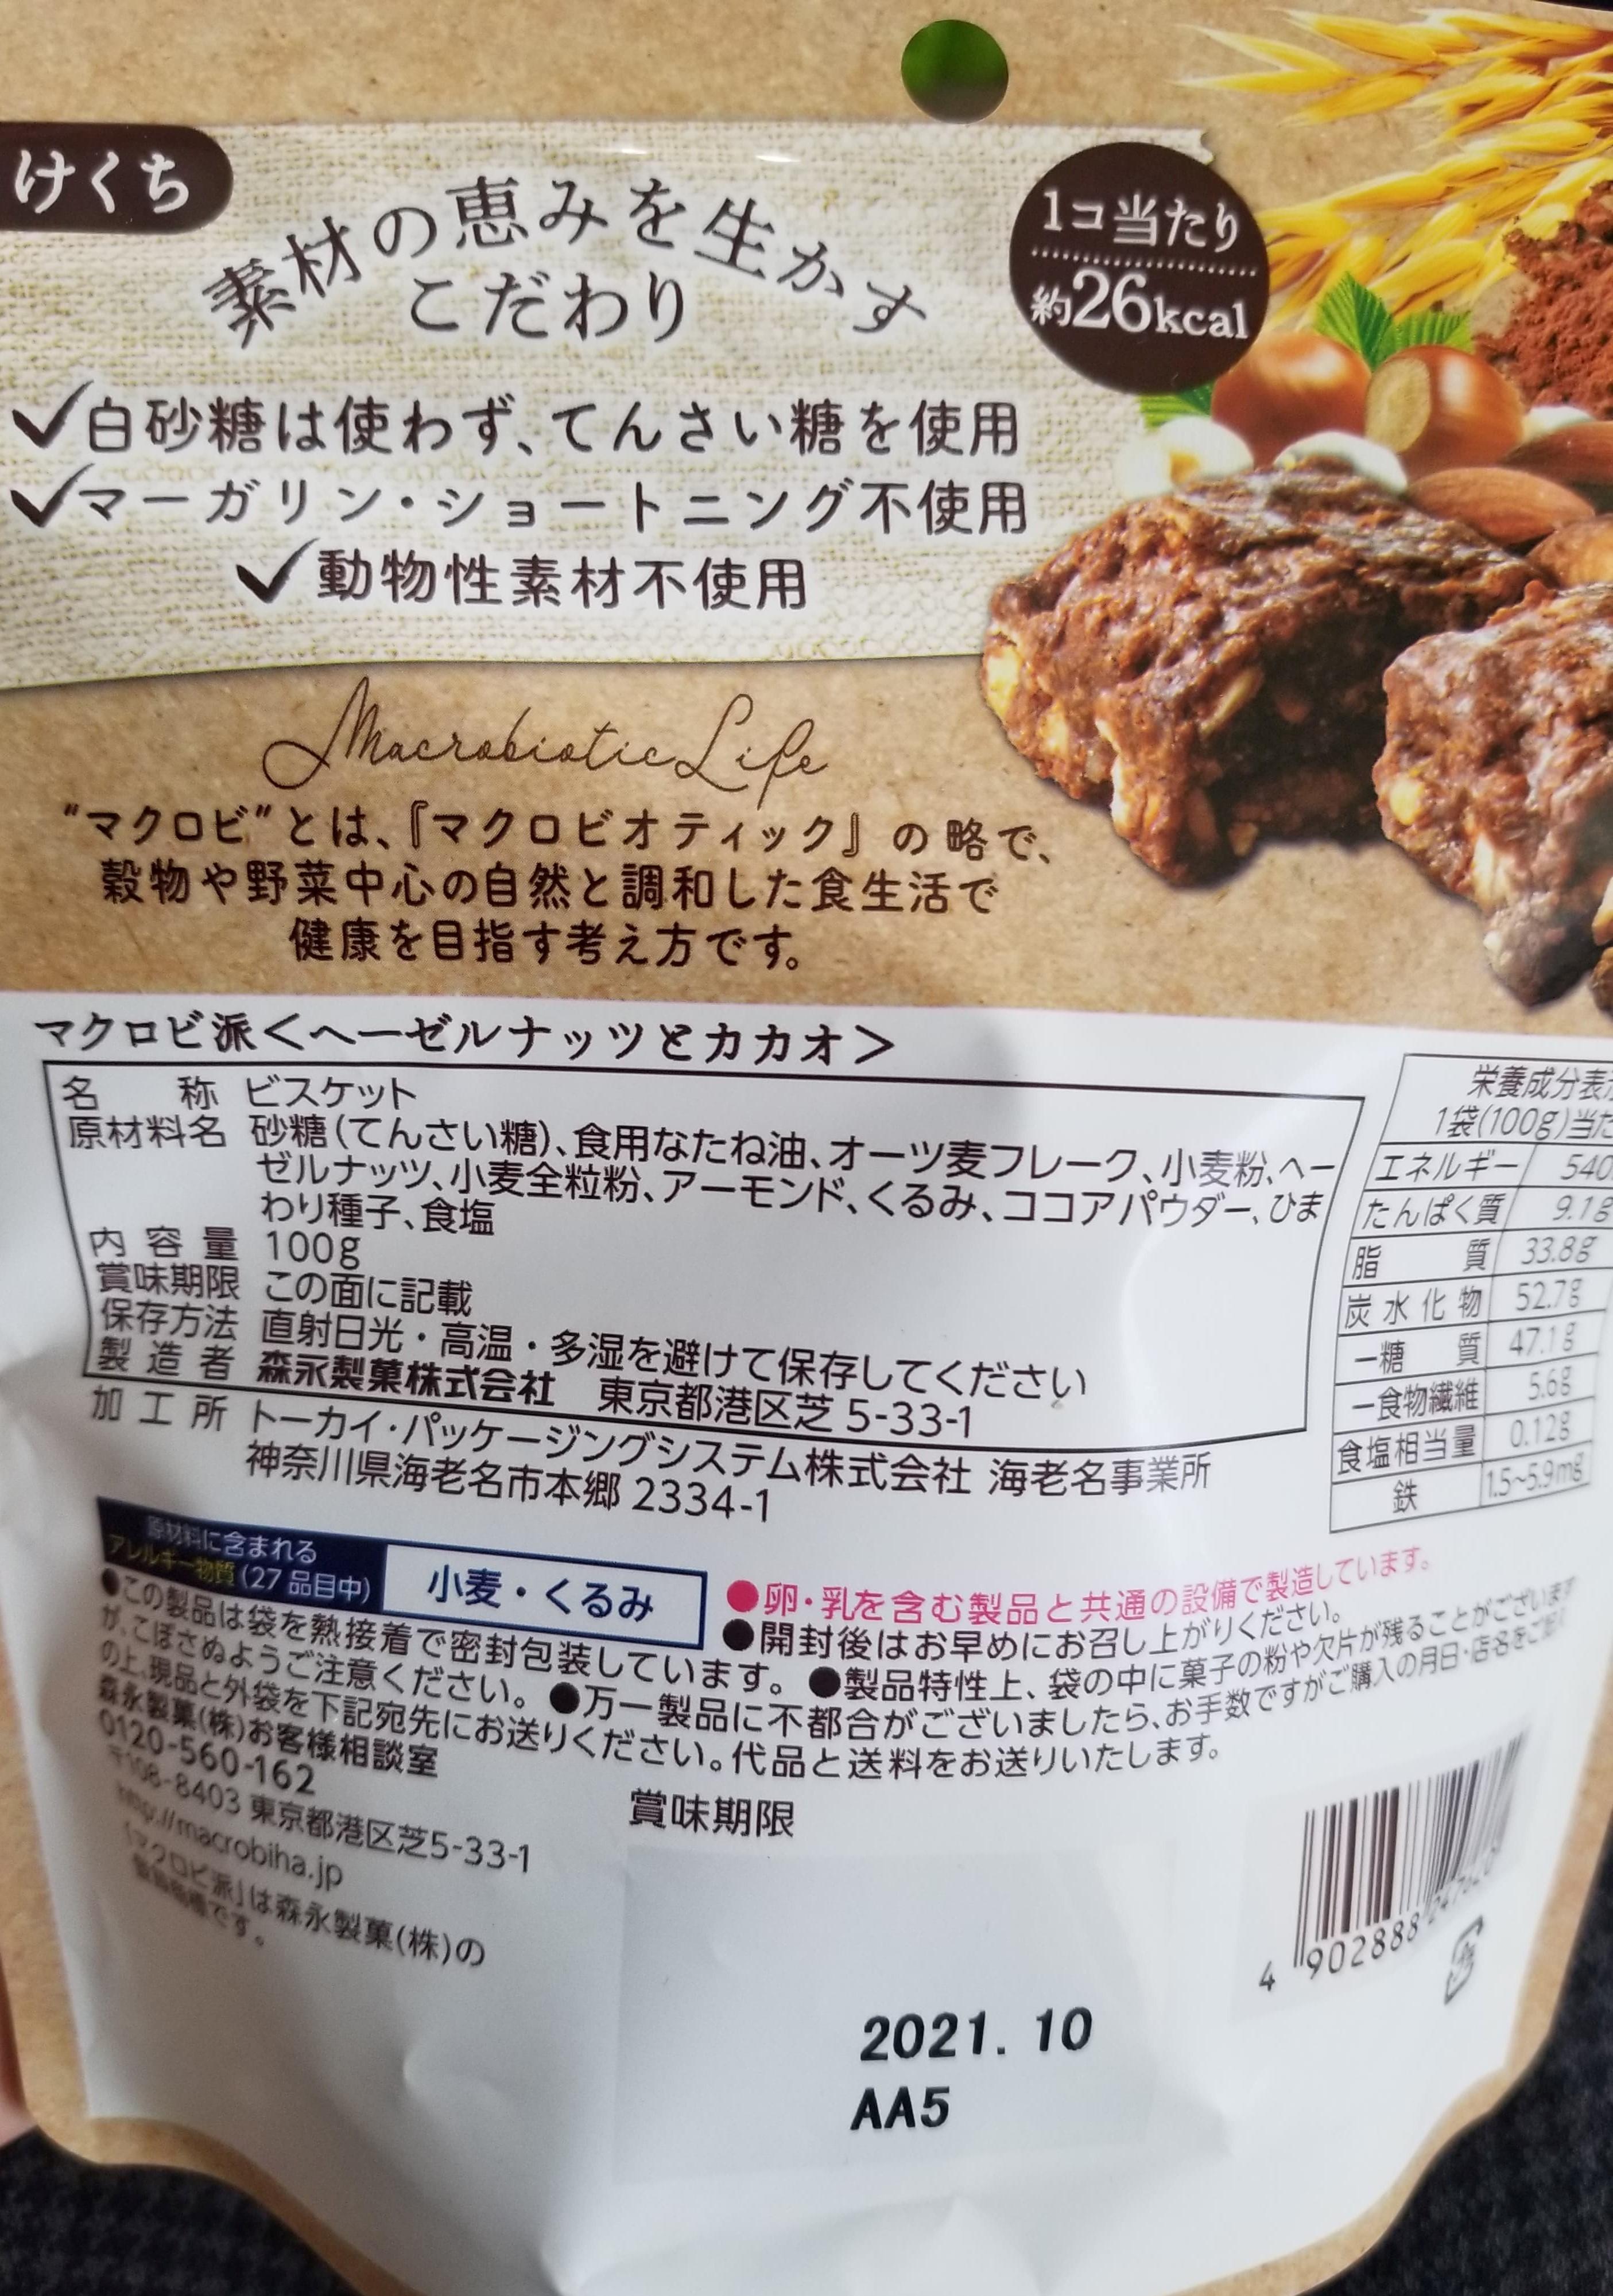 Morinaga Macrobiha Hazelnuts and Cocoa back of package